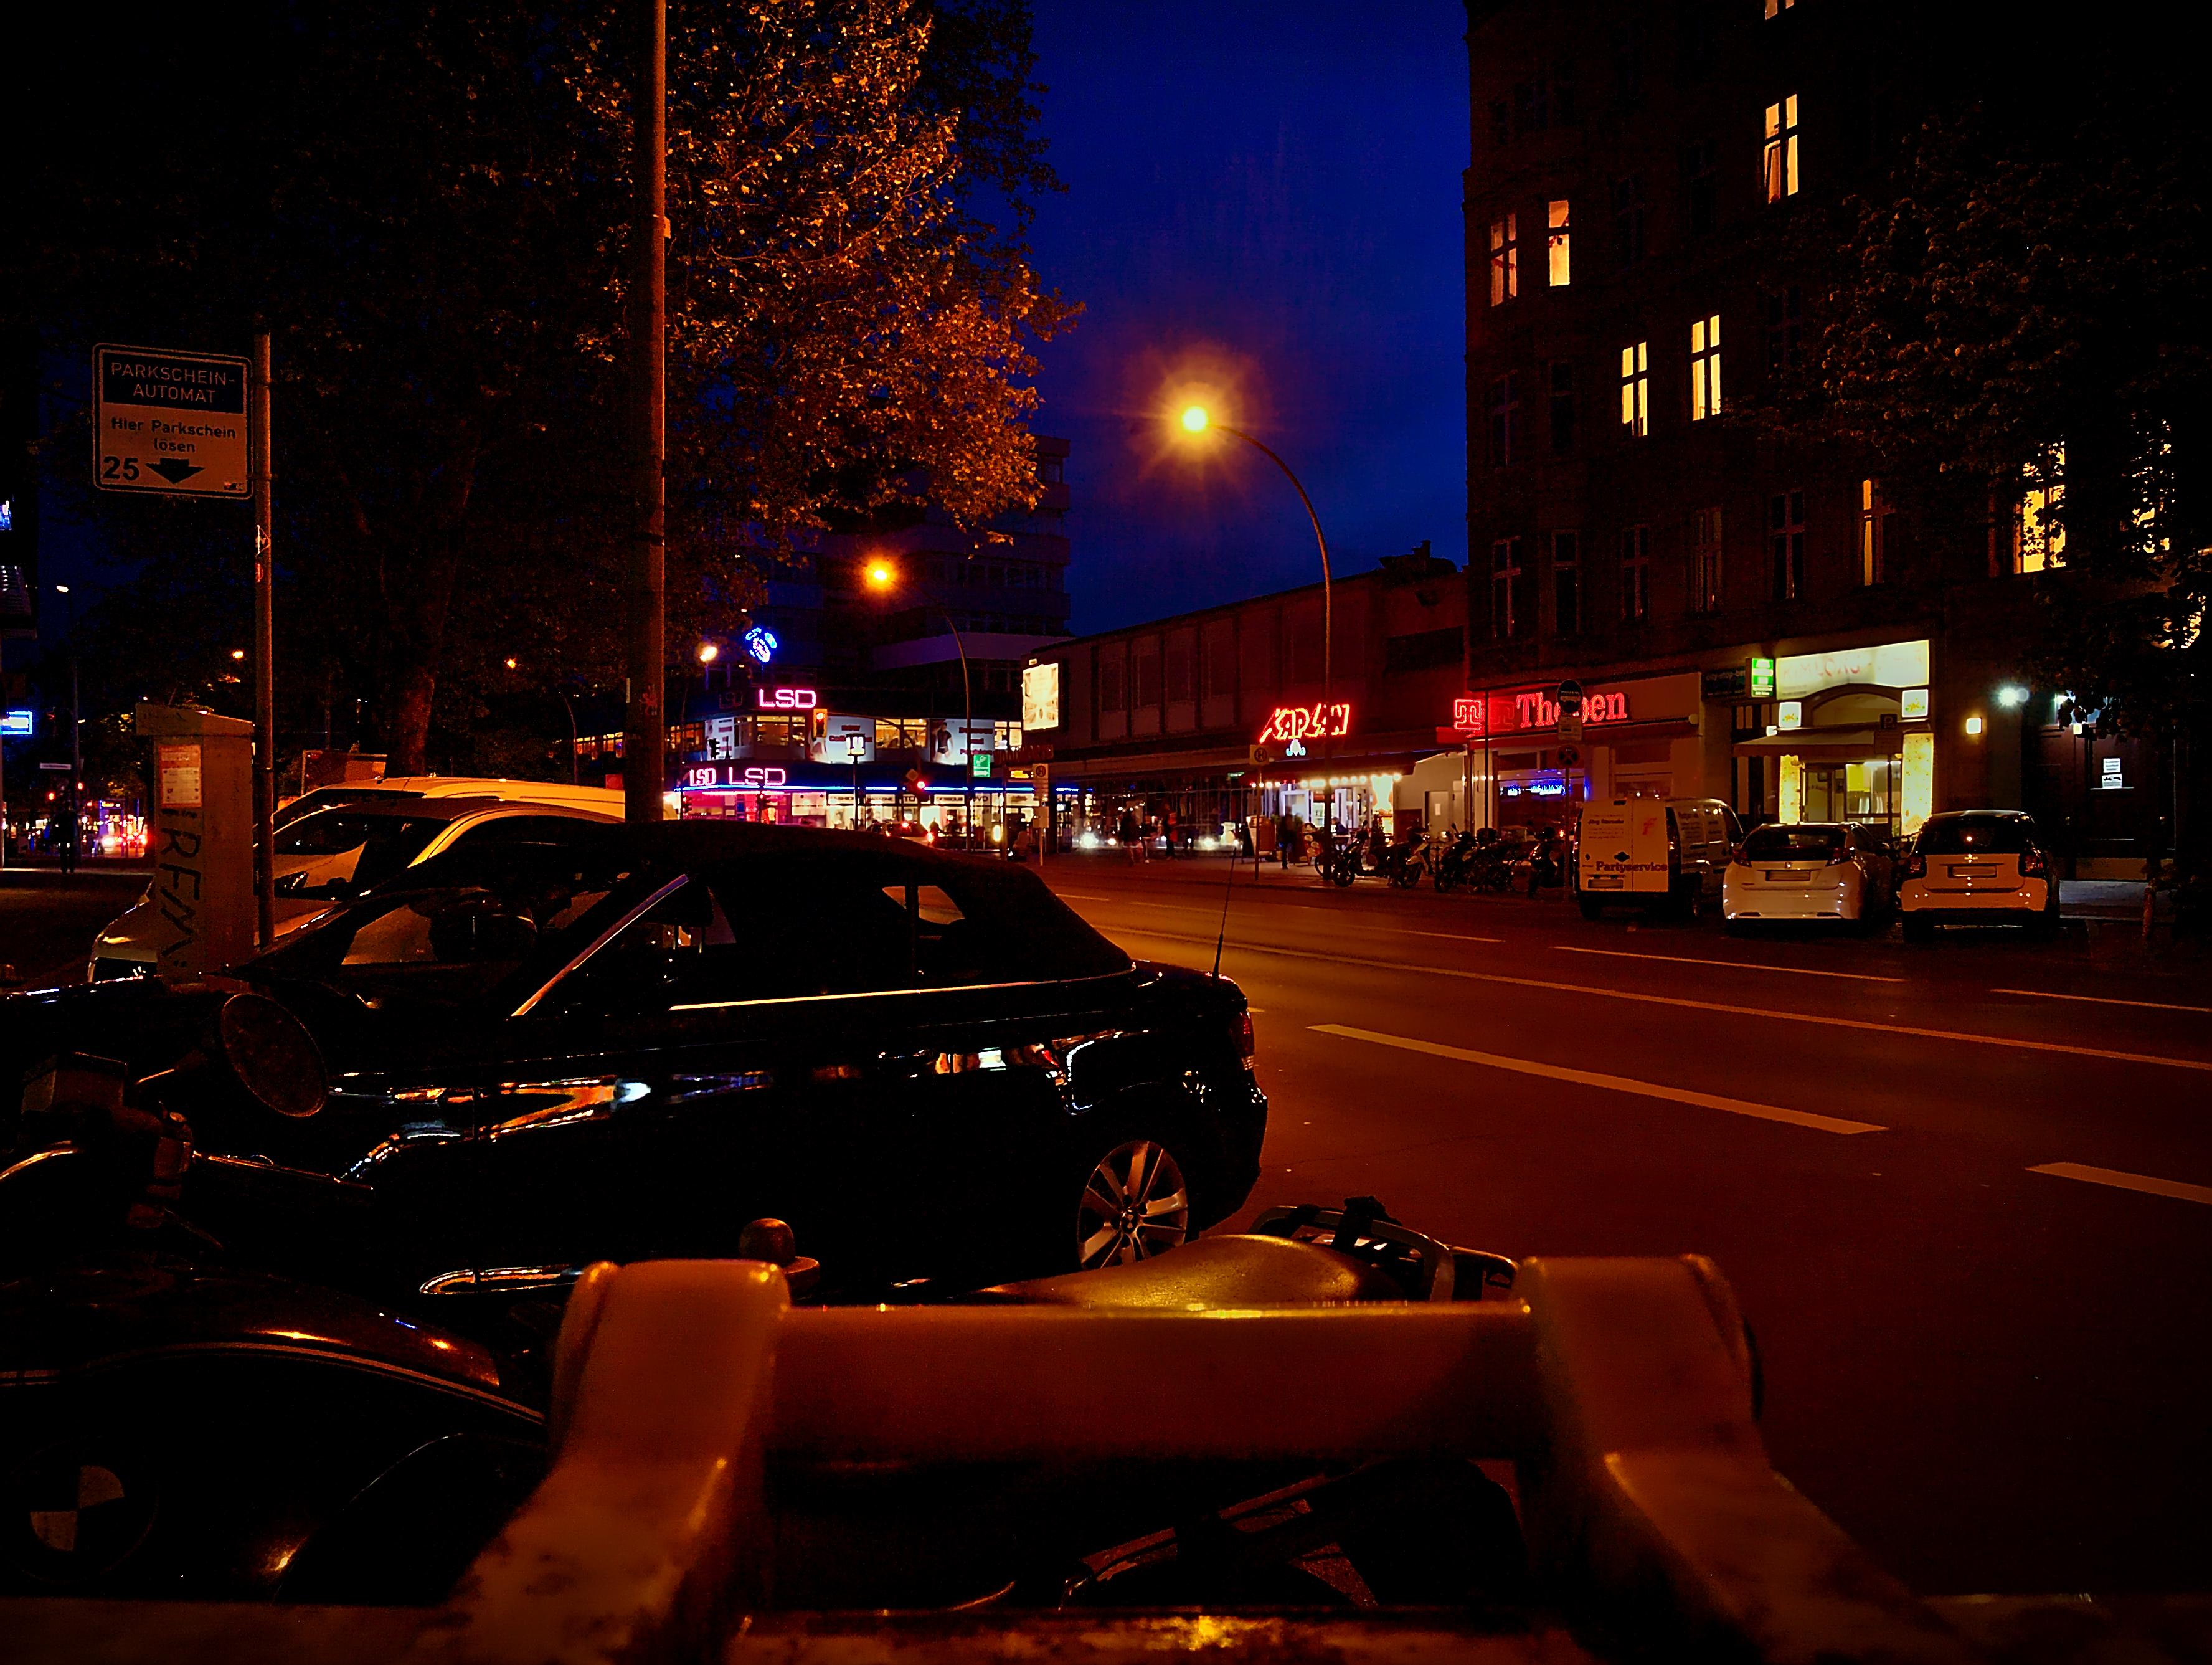 LSD_Potsdamerstrasse_Berlin_Schöneberg.png